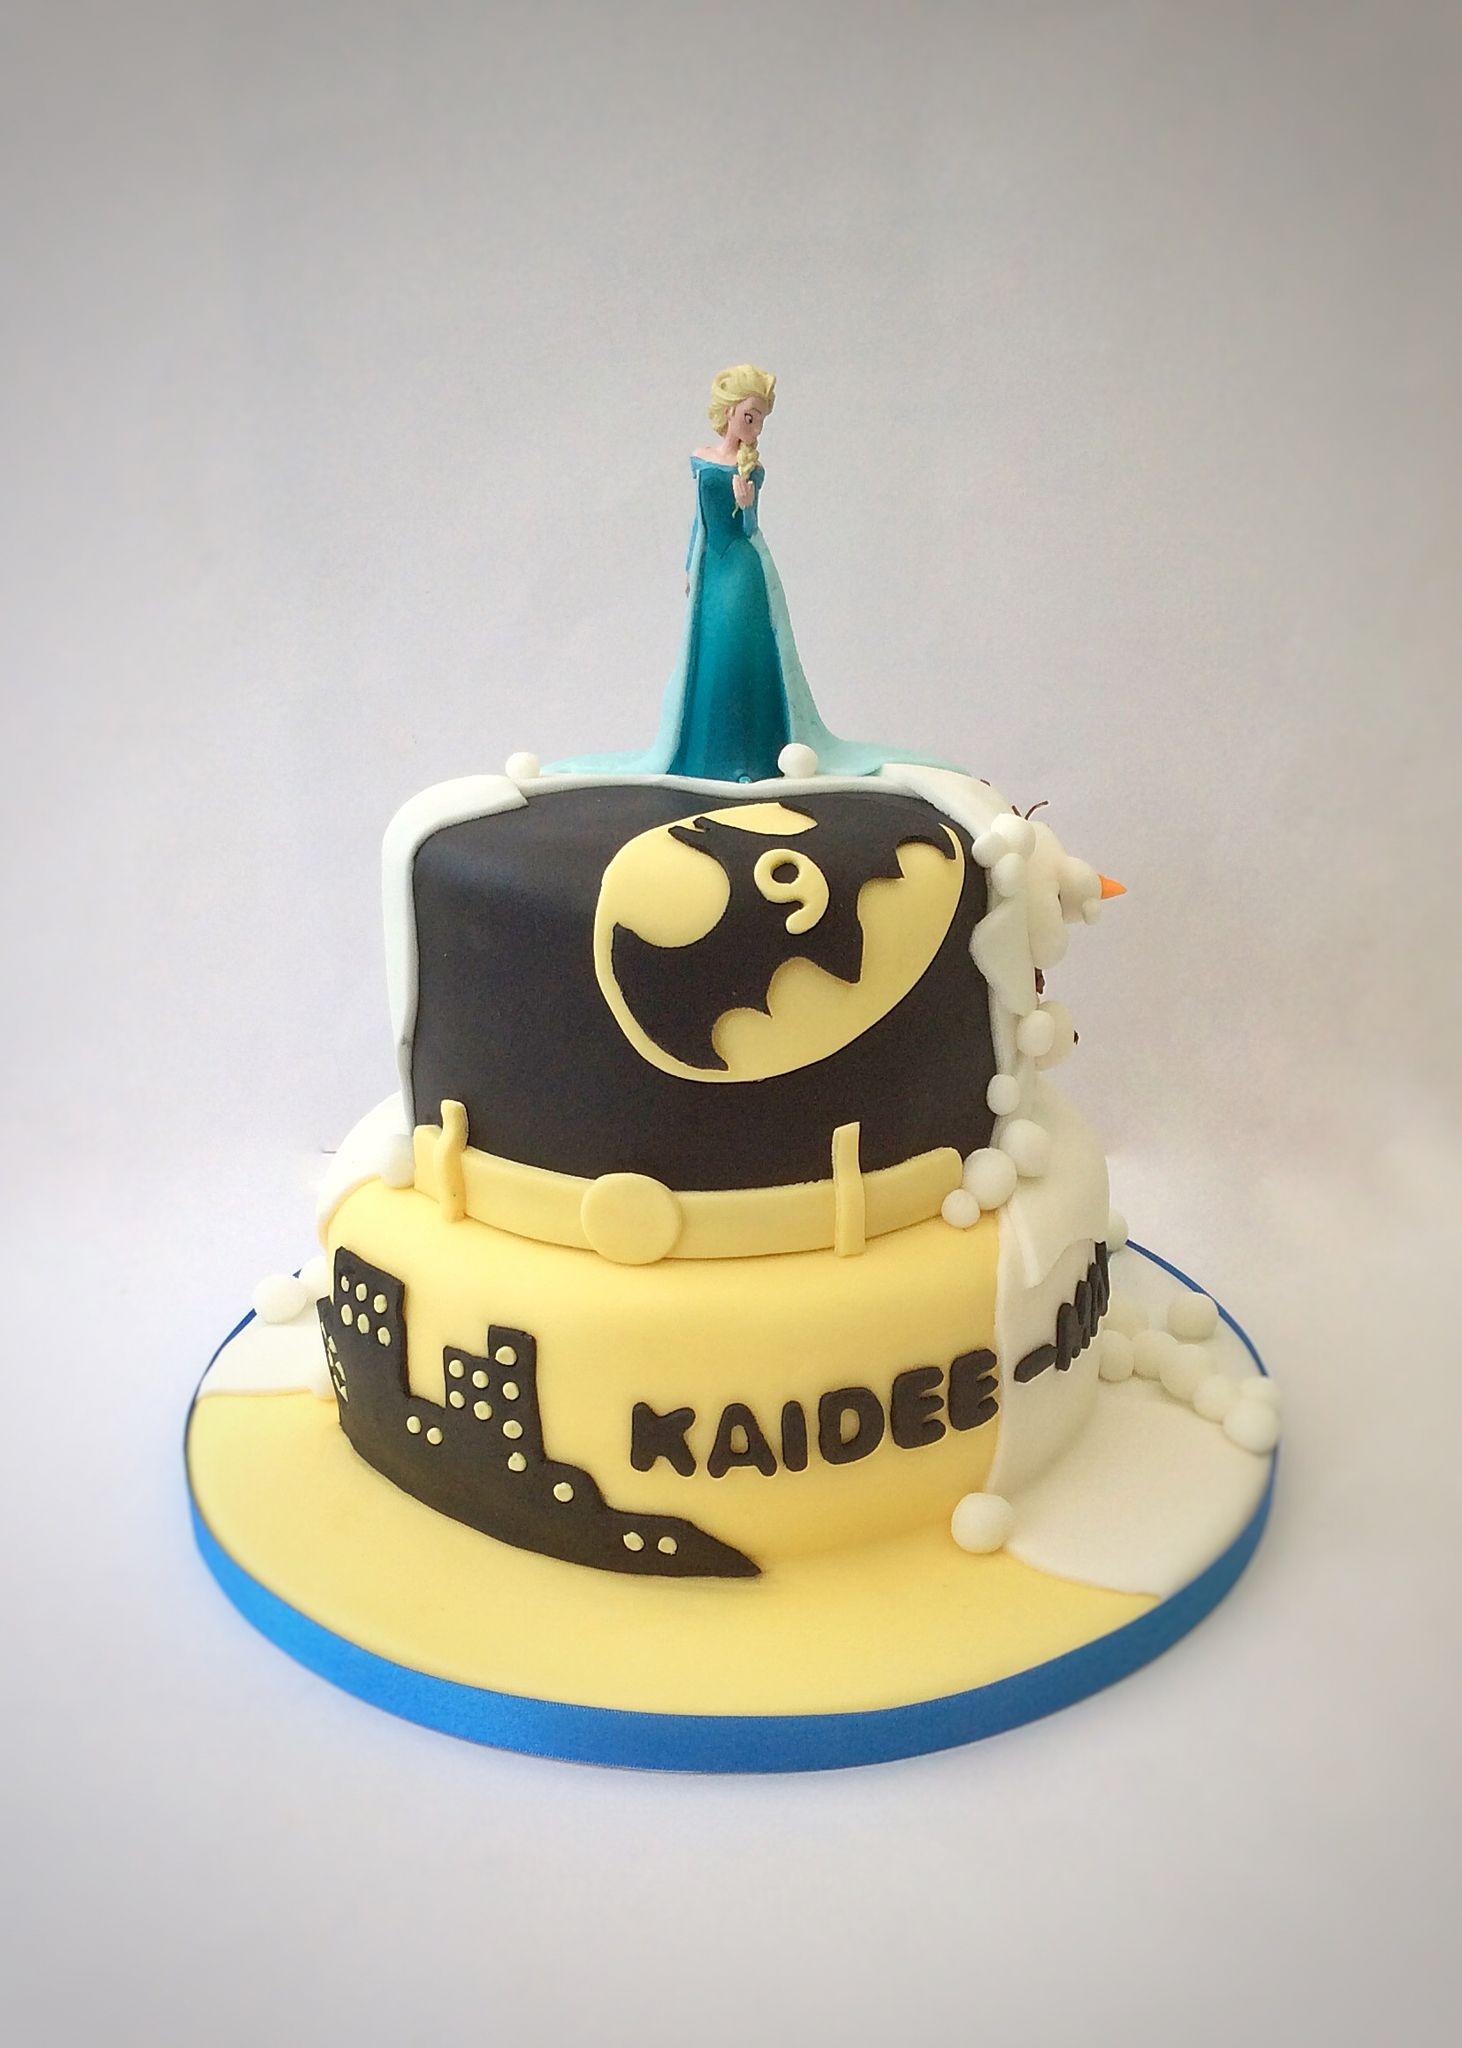 Half Frozen cake, half Batman cake | Boy cakes | Pinterest | Batman ...